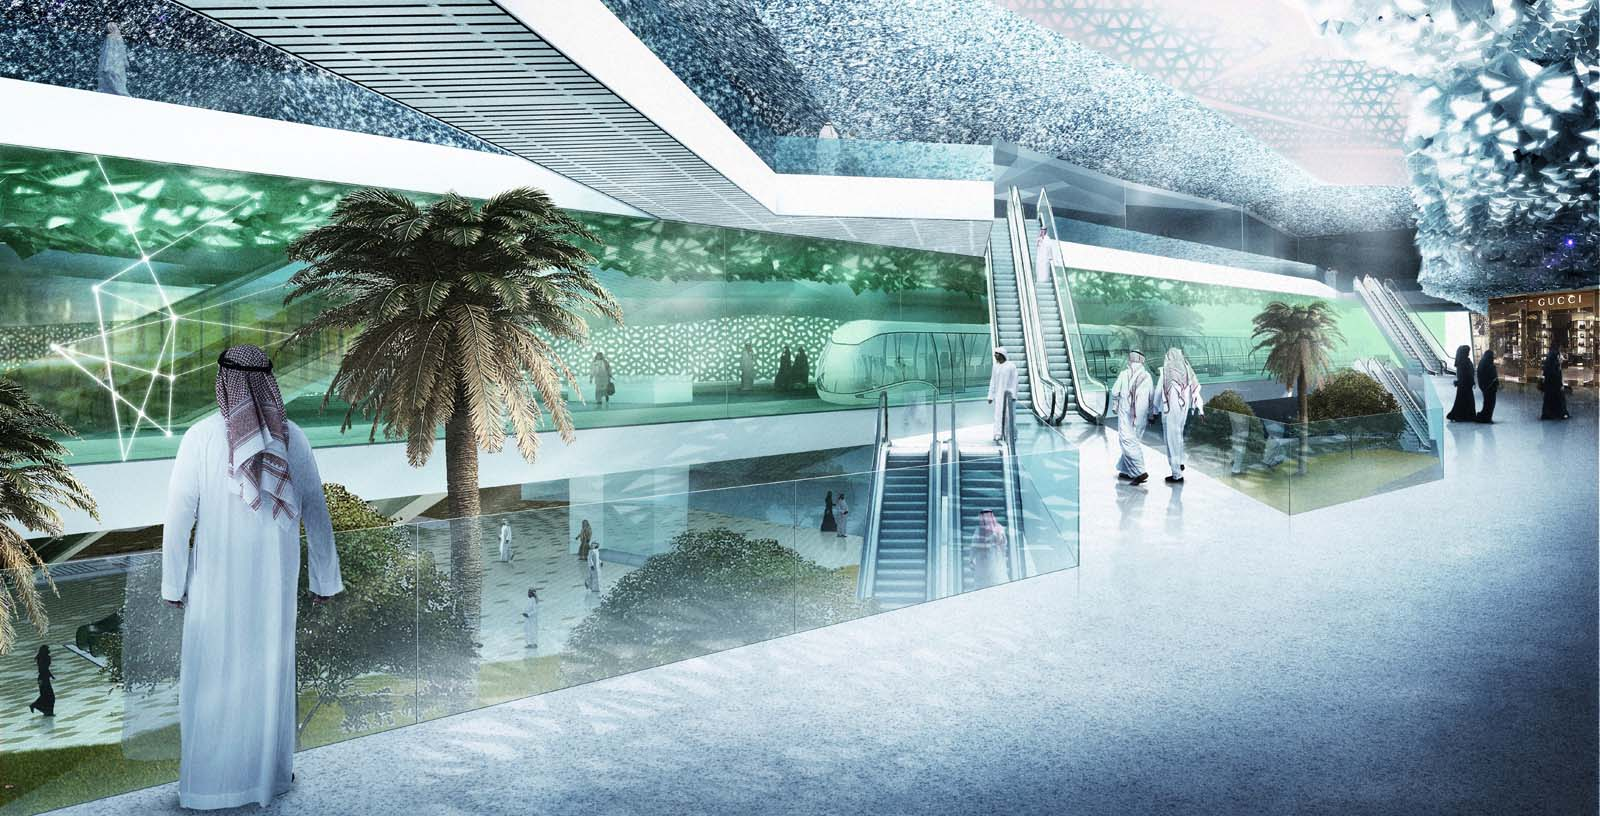 Master_plan_Jeddah_01_Architecture_IDOM